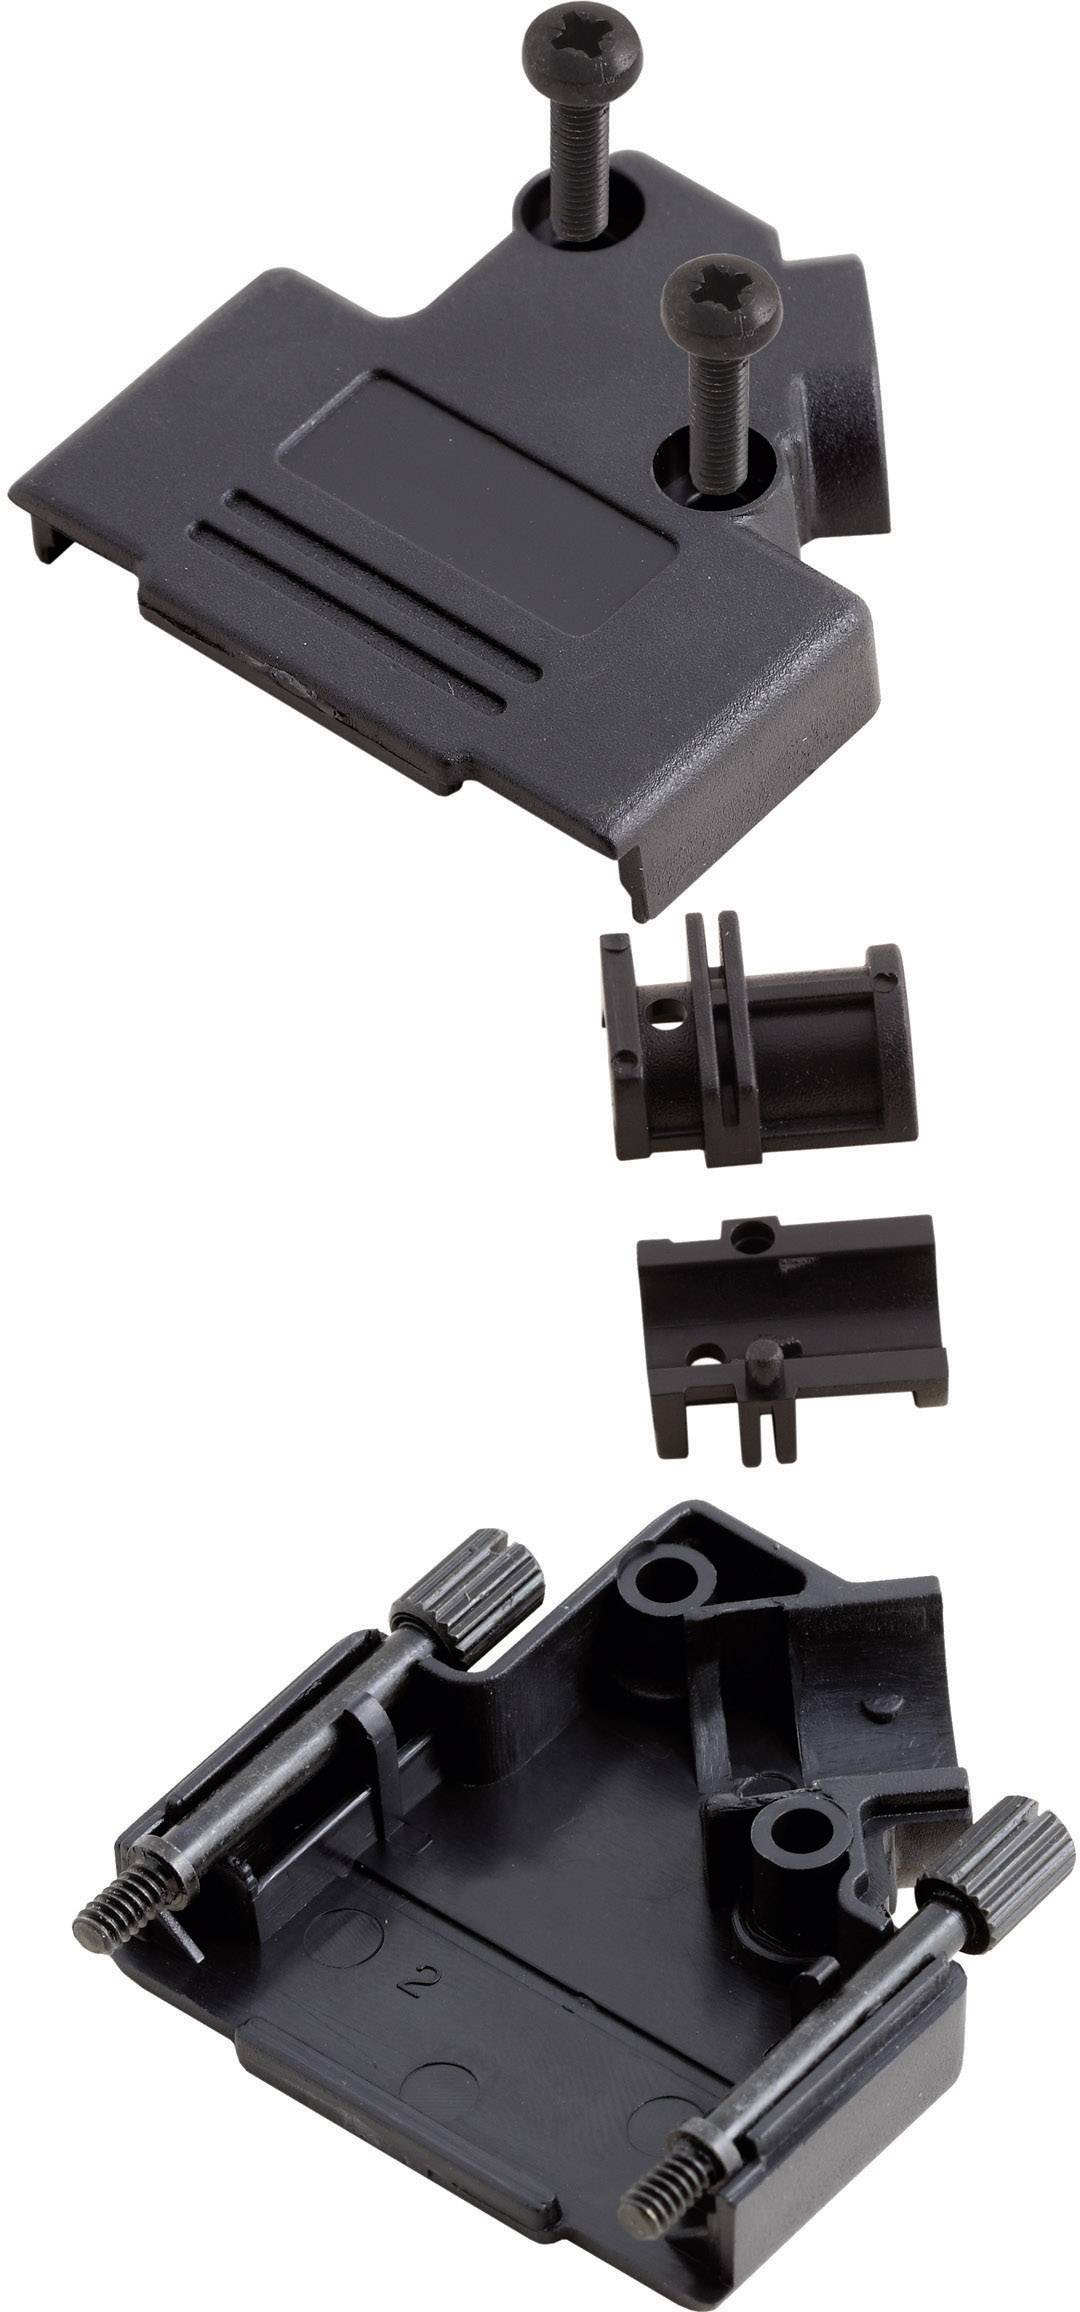 D-SUB púzdro MH Connectors MHD45PPK-15-BK-K 6560-0107-12, počet pinov: 15, plast, 45 °, čierna, 1 ks